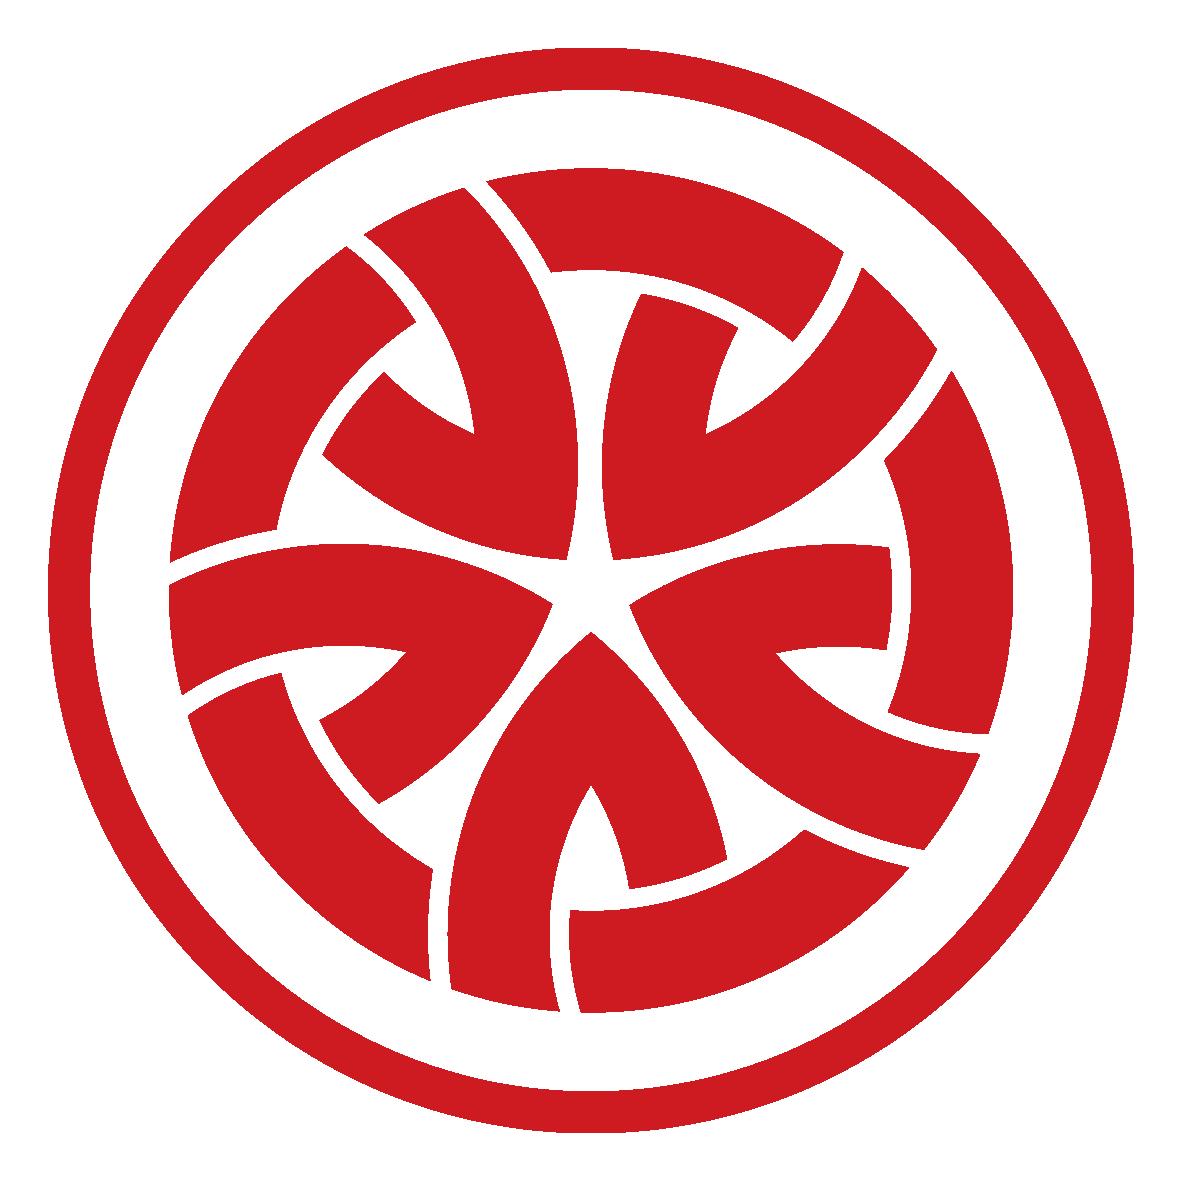 Kagami-ryú